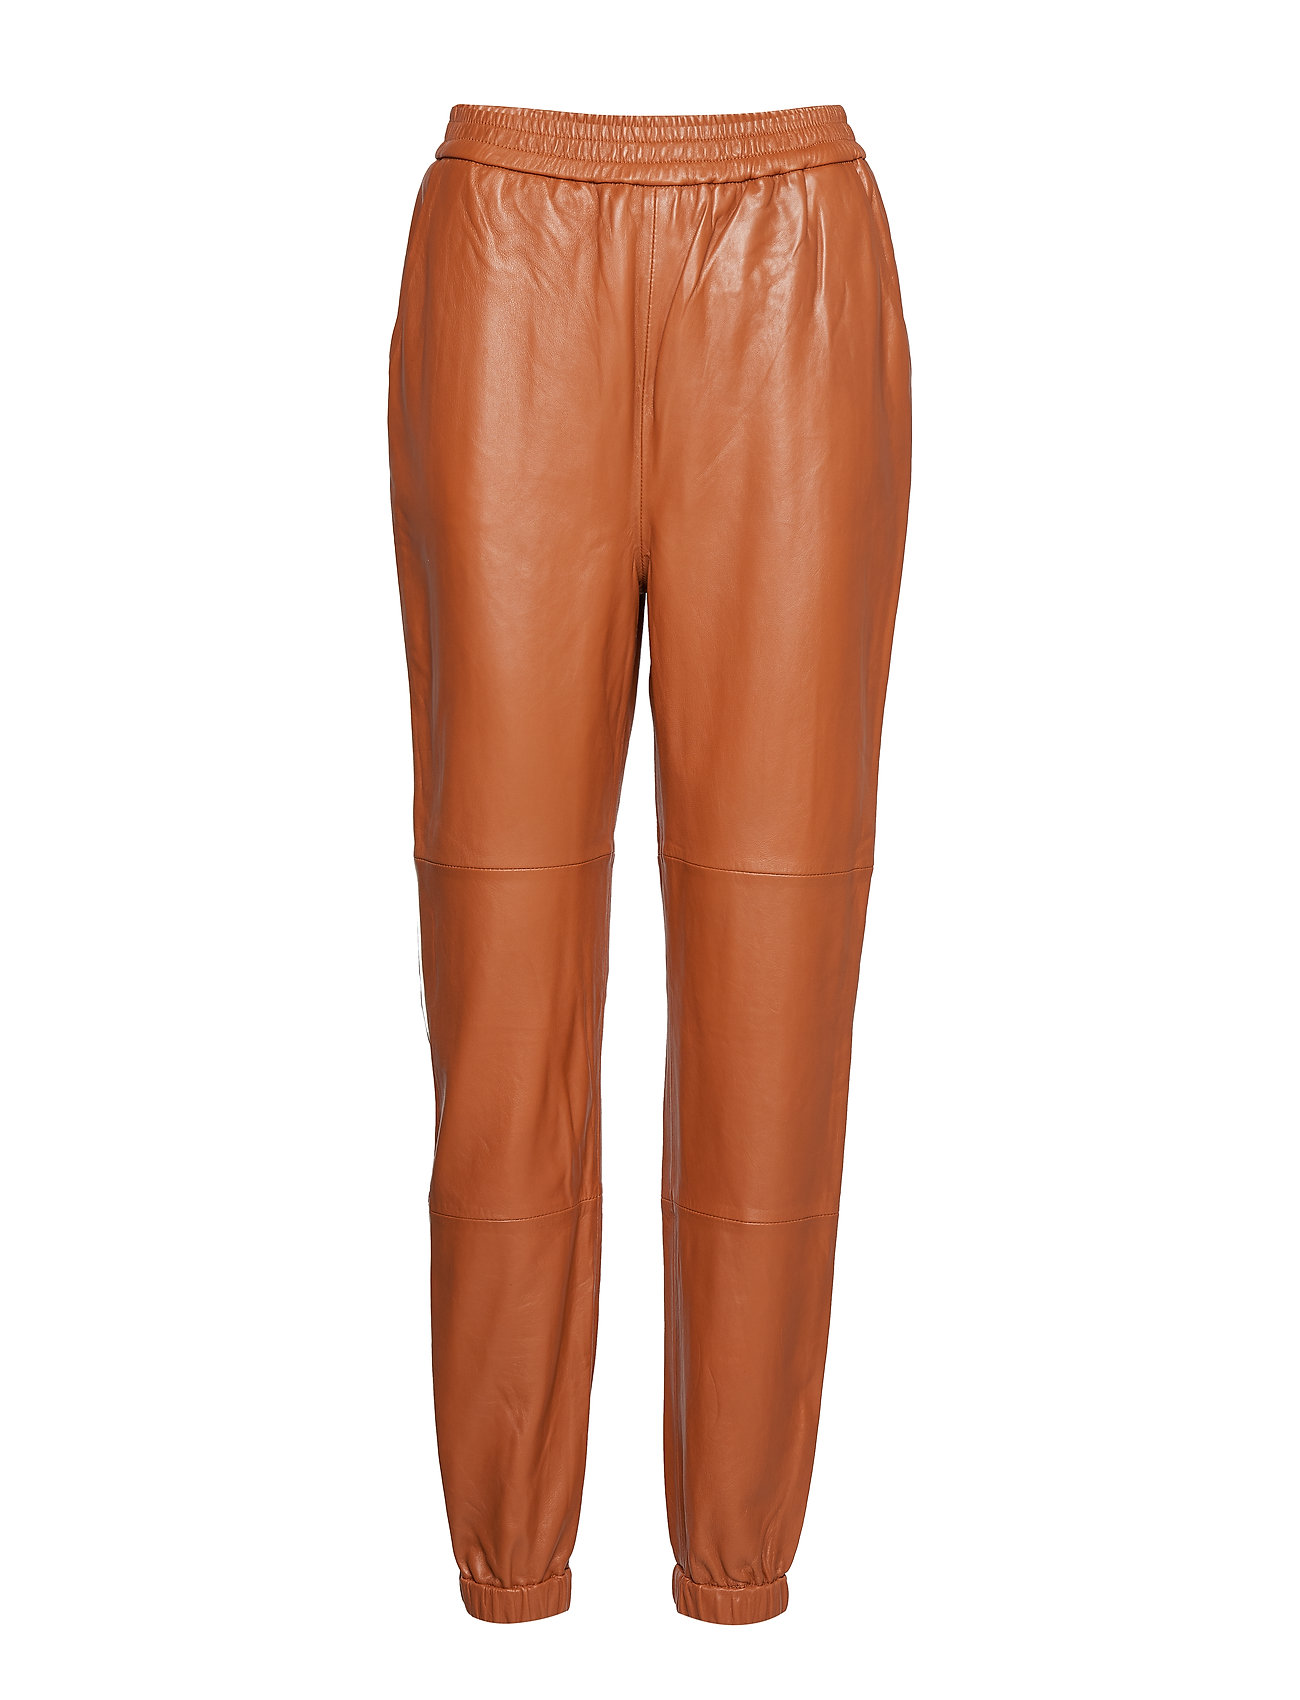 Image of Vanagz Pants Ma19 Leather Leggings/Bukser Orange GESTUZ (3215647261)